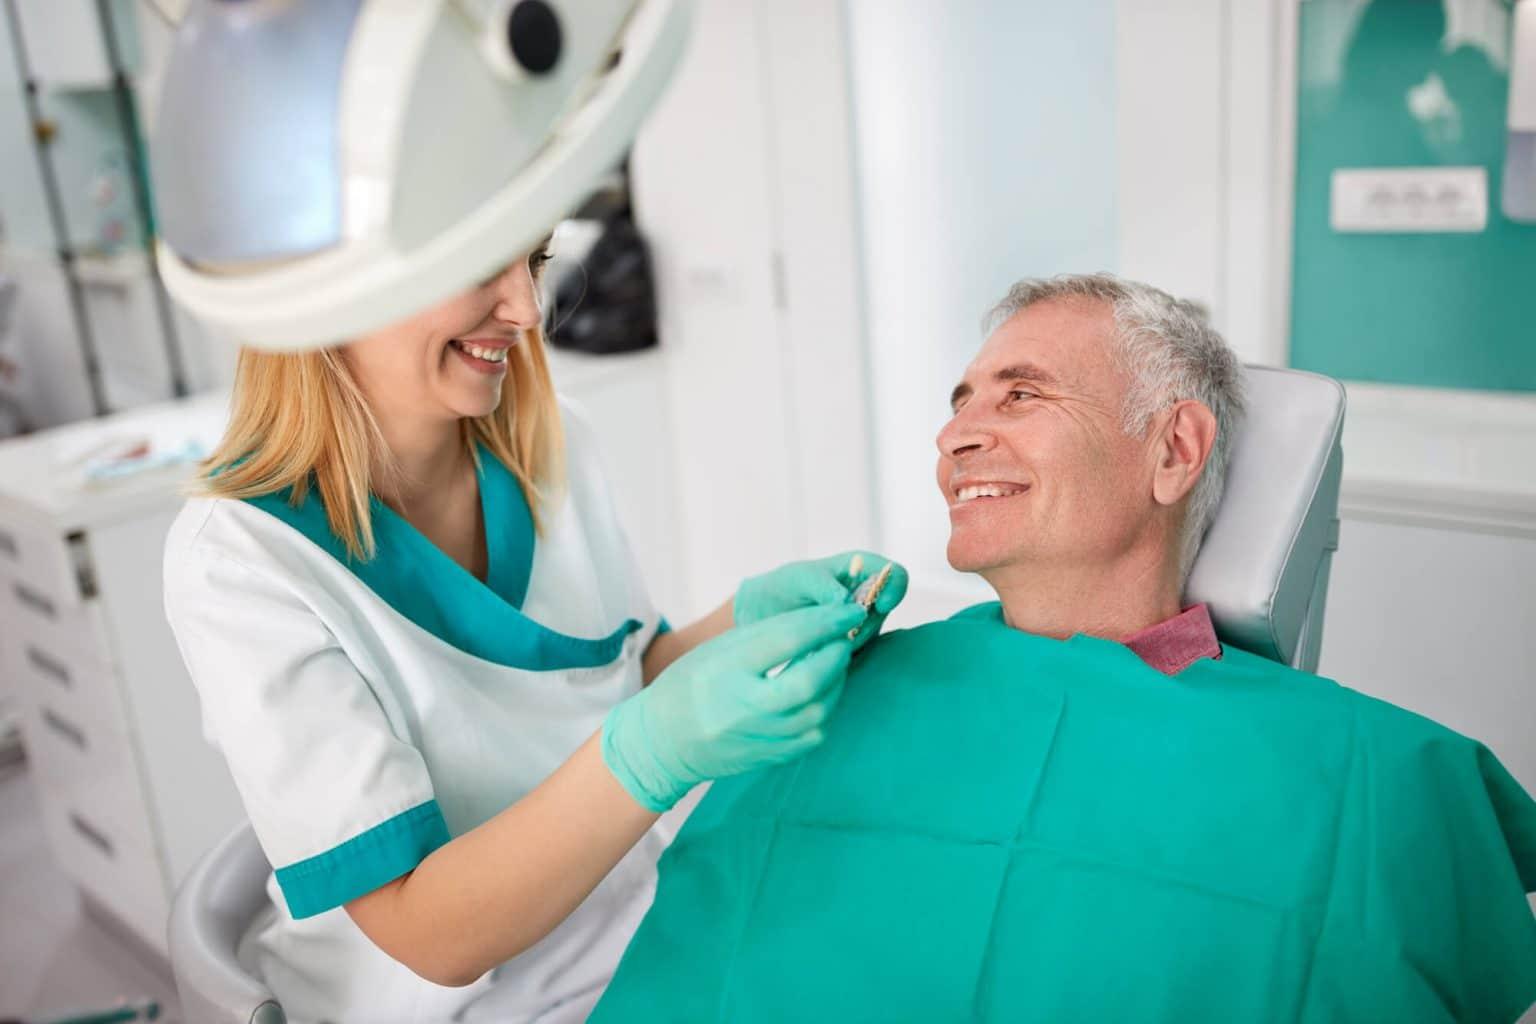 Oak Park Dentistry